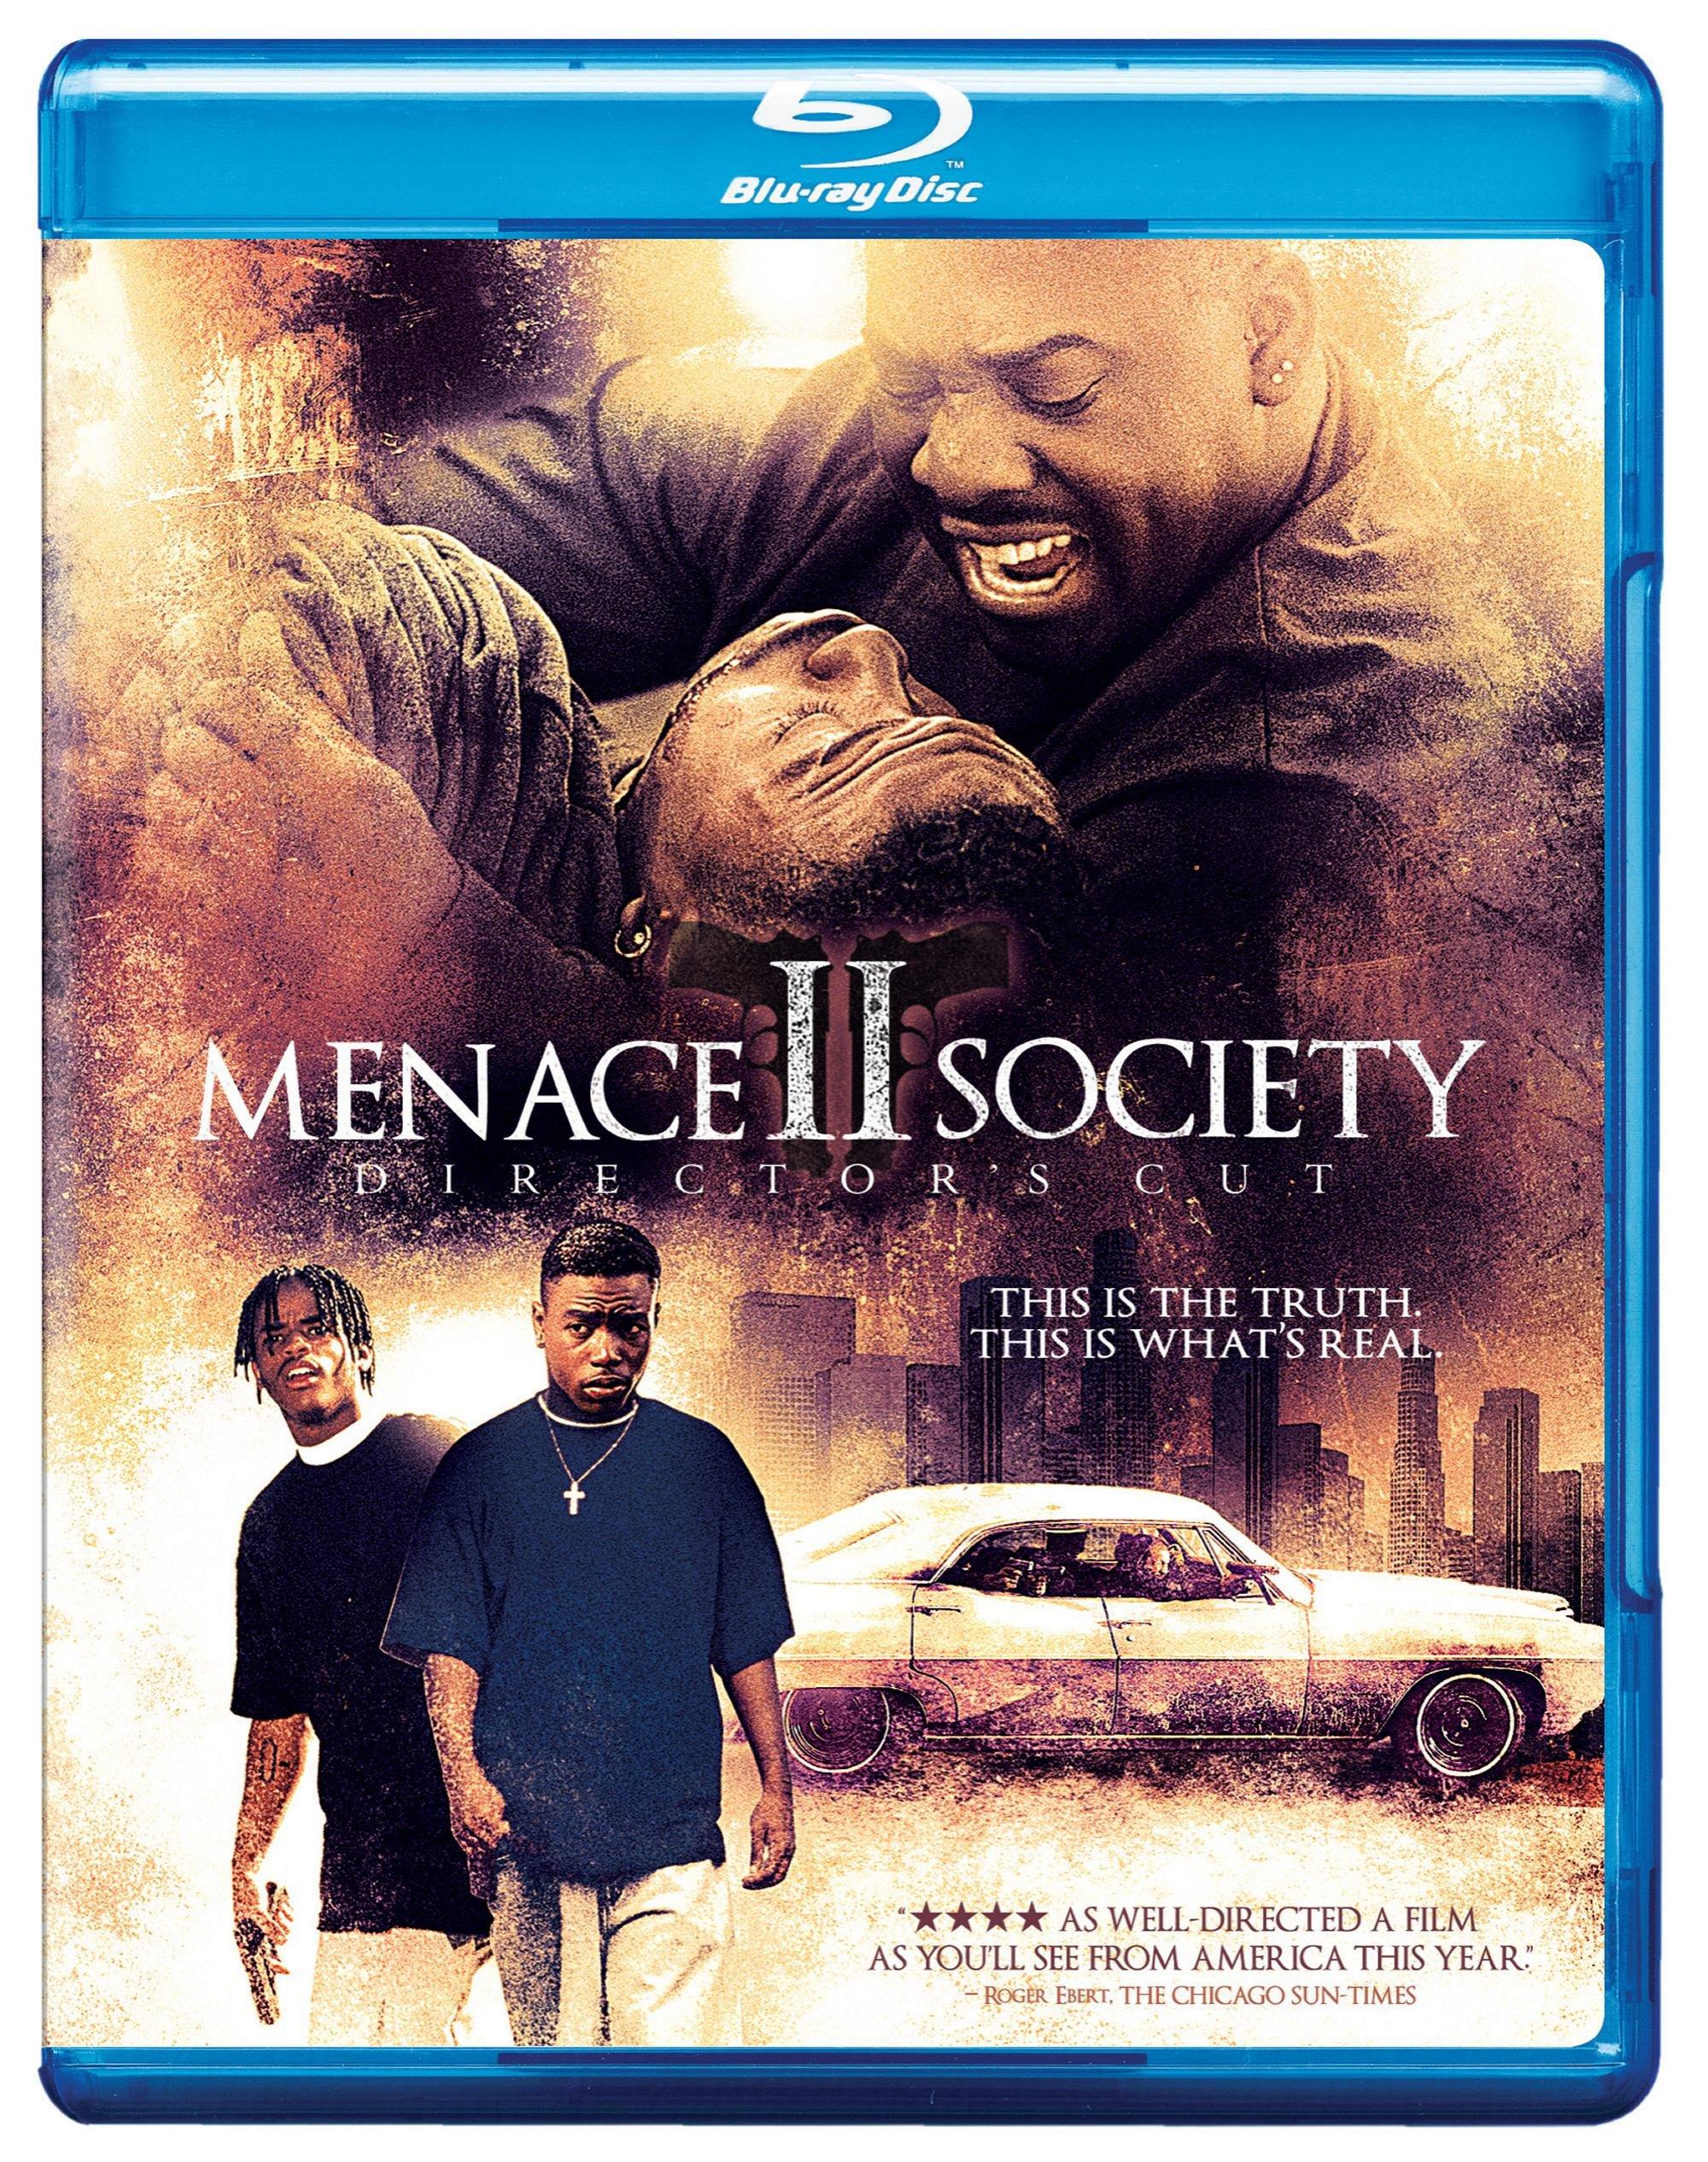 Blu-ray : Menace II Society [Widescreen] [Director's Cut] (Director's Cut / Edition, Widescreen)